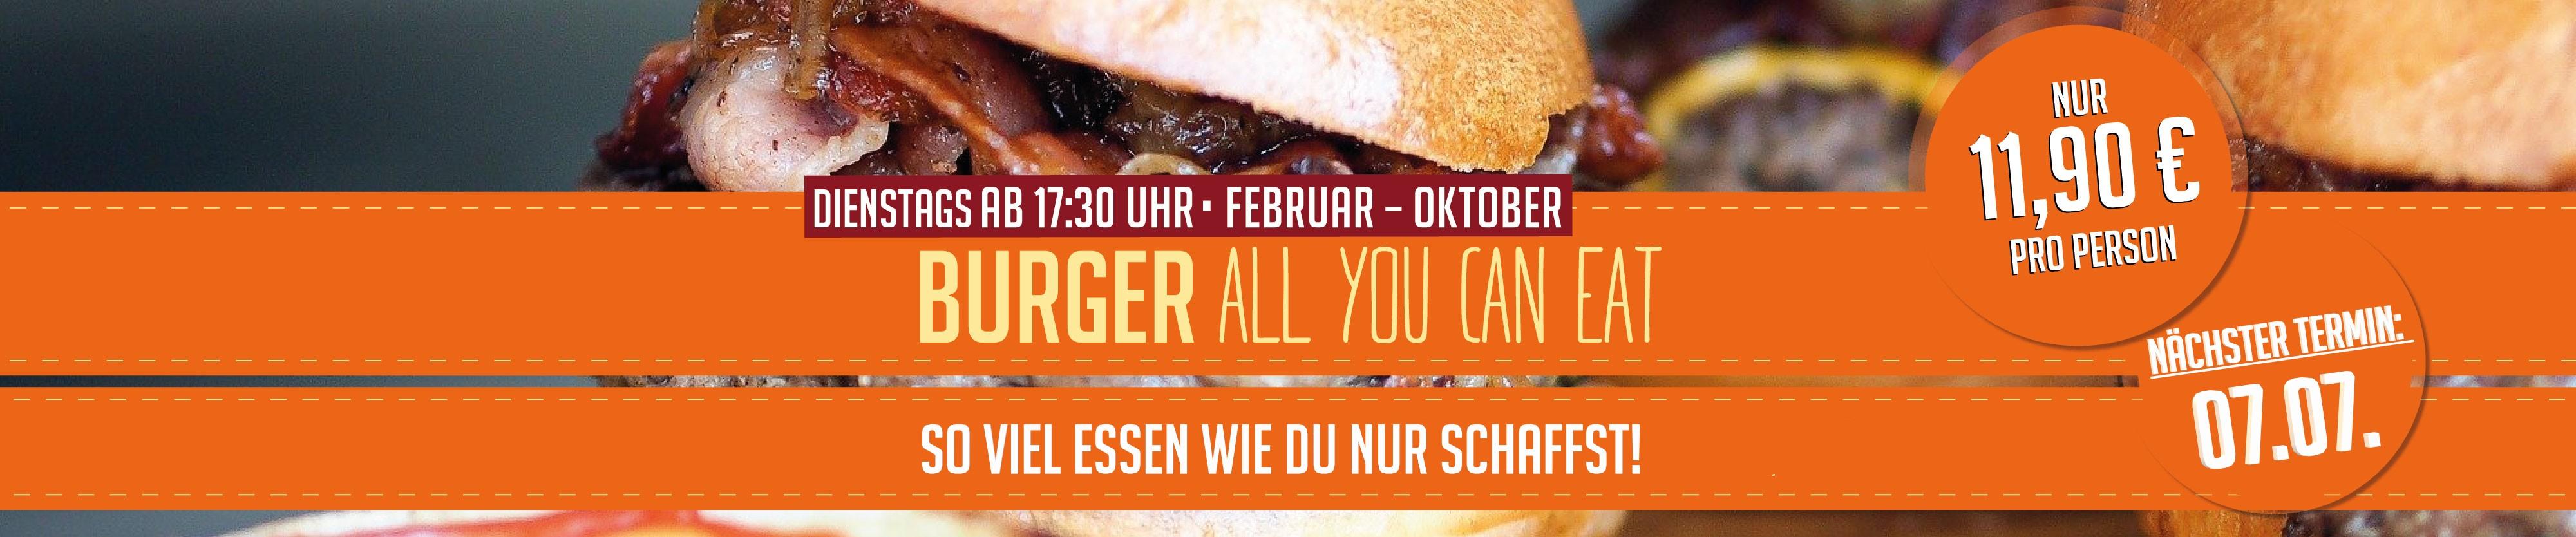 BNL_Burger_AYCE_HP_Banner_1920x400_20200707